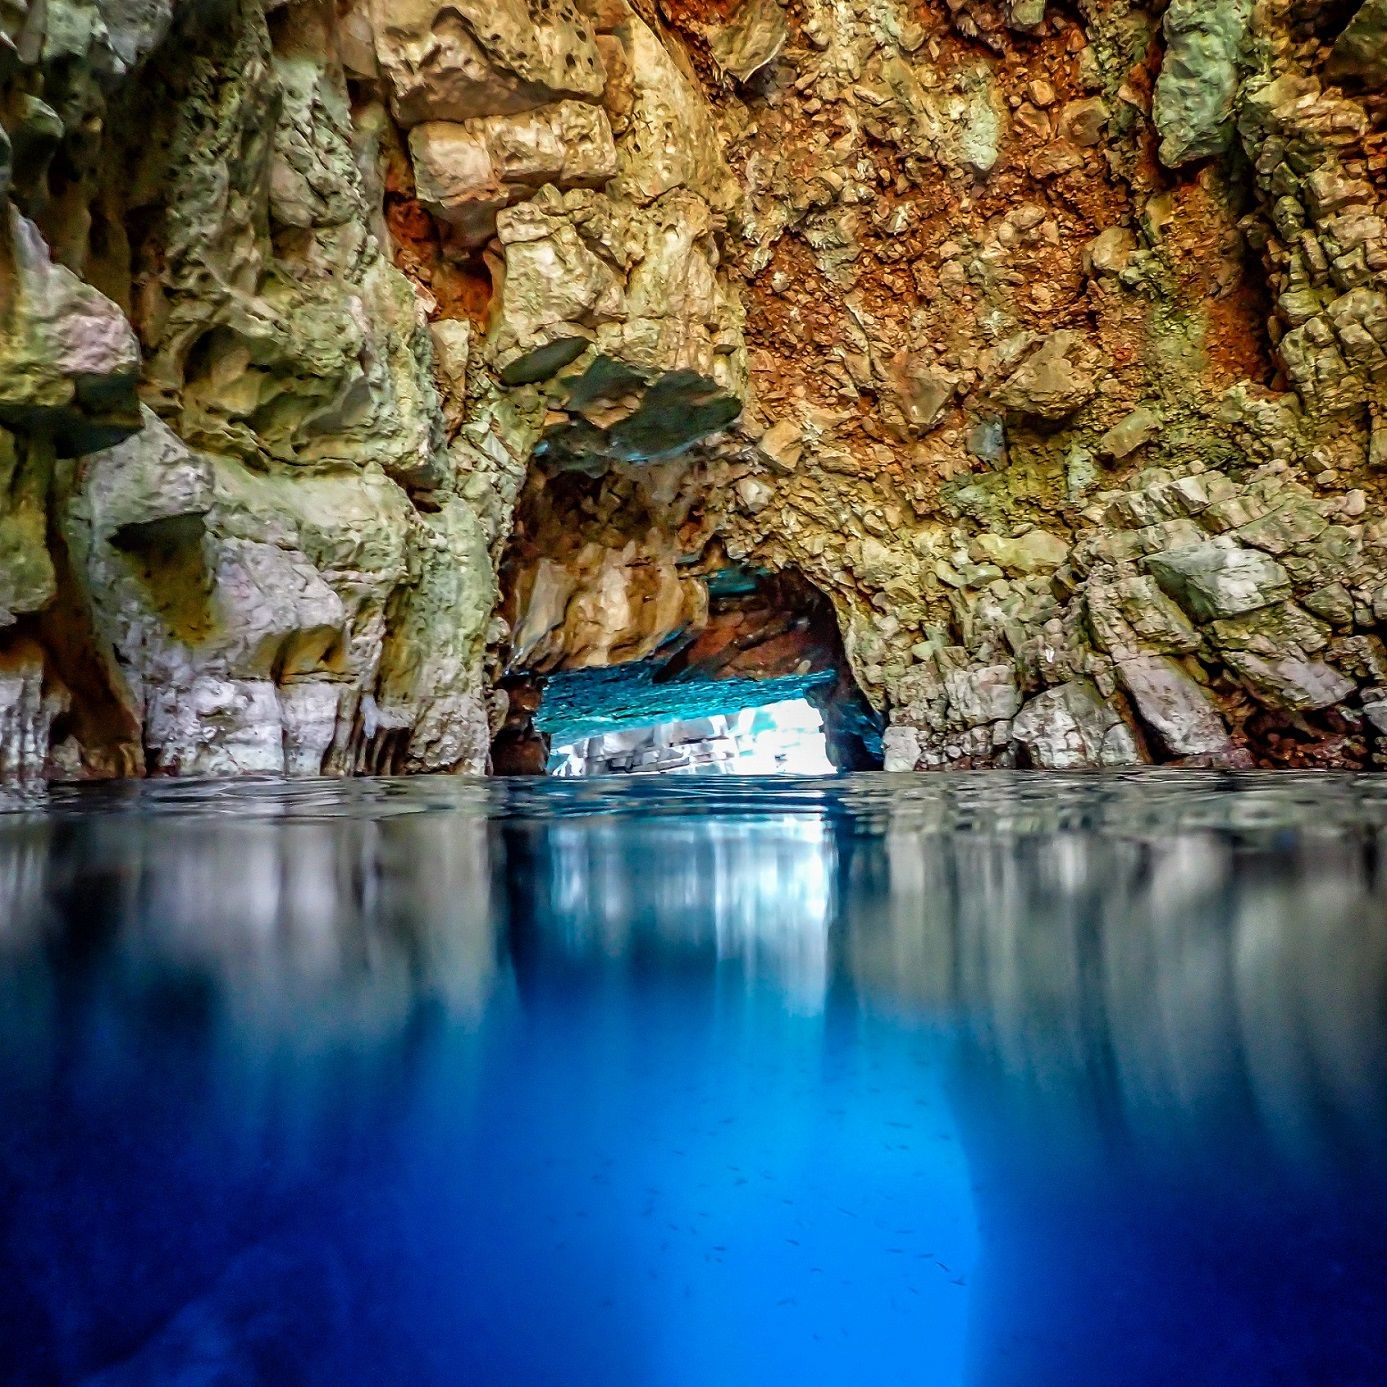 Route Bofc 226 Land Adriatic Cruise From Zagreb 10 Days Best Of Croatia Croatia Travel Sailing Croatia